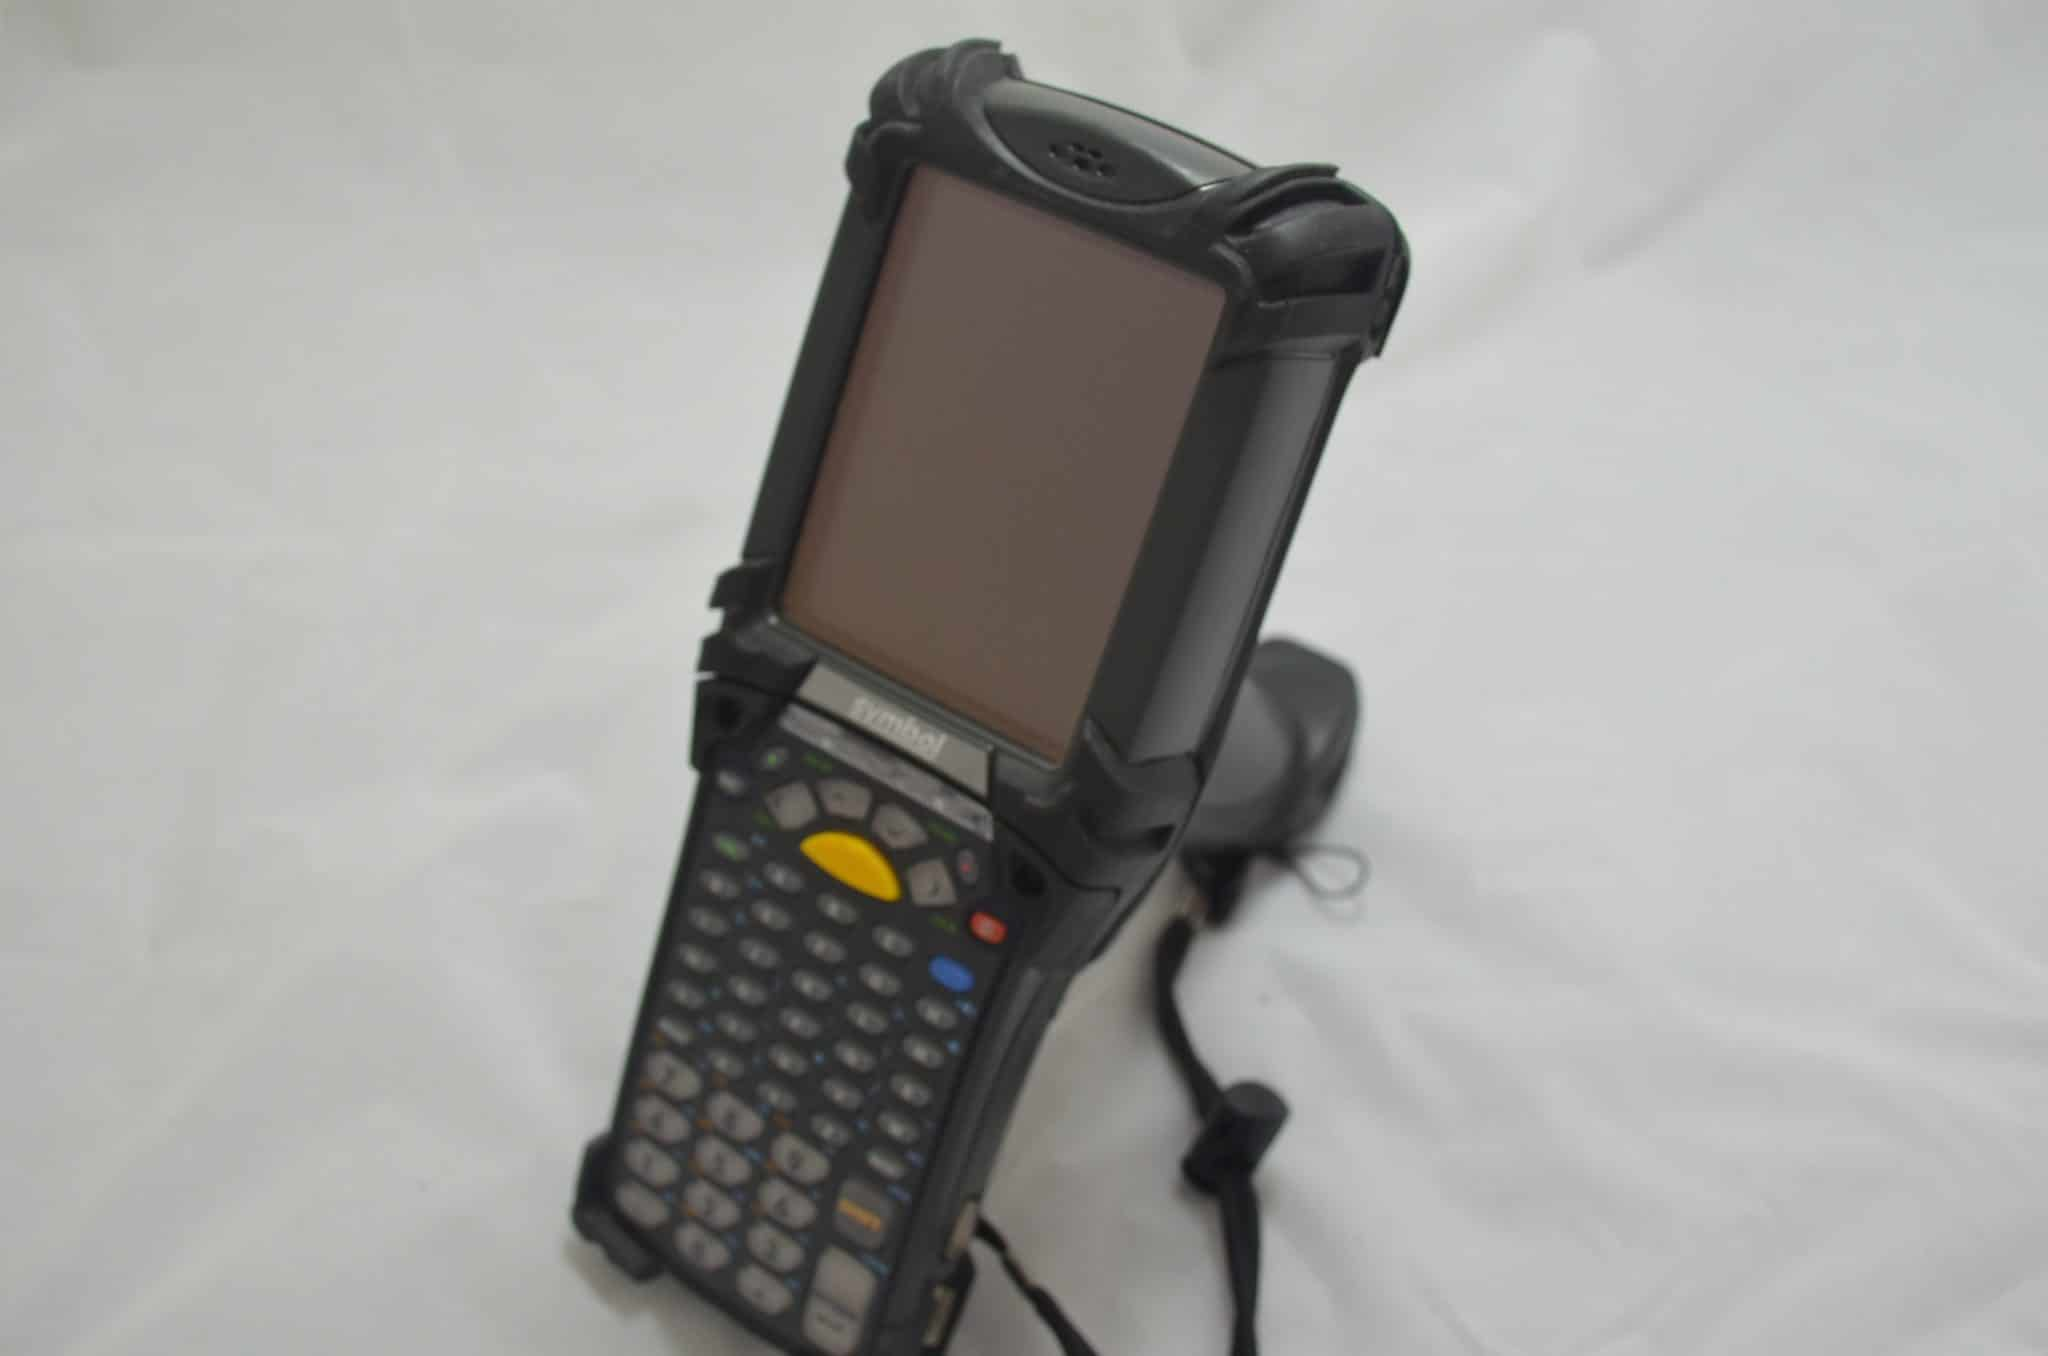 Symbol-Motorola MC9090 Handheld Scanner - Barcode-House ...